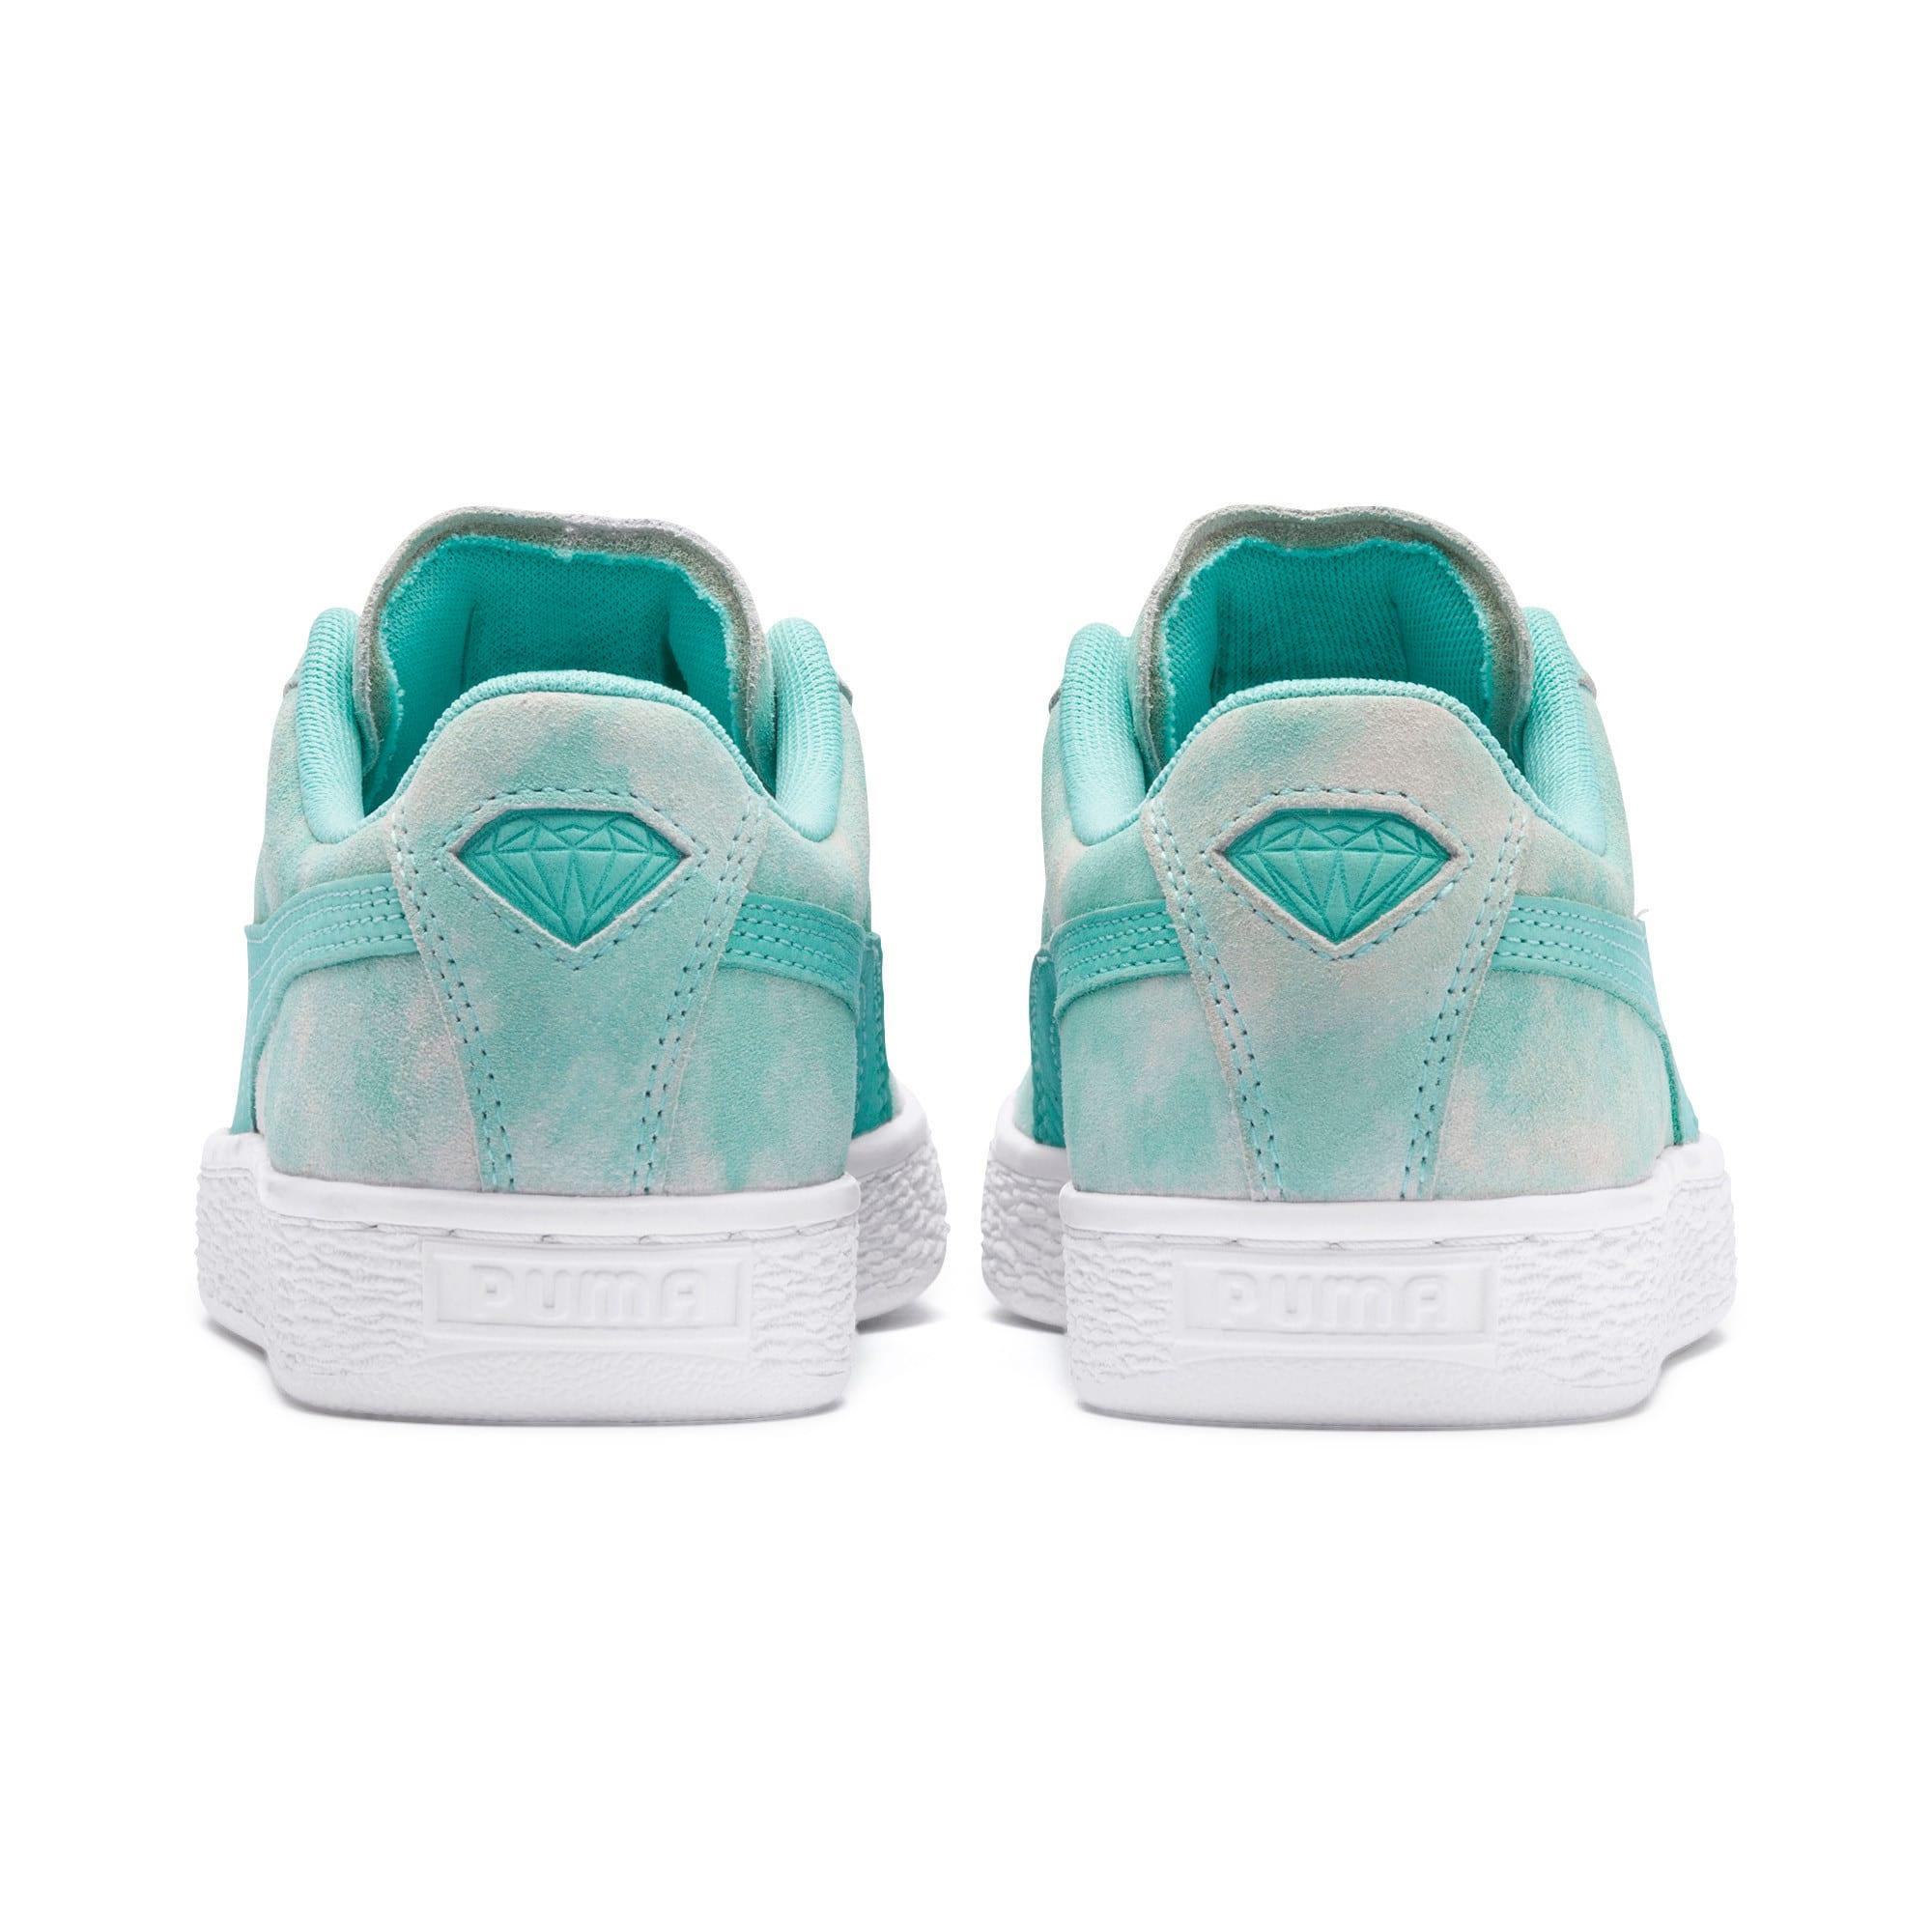 Thumbnail 4 of PUMA x DIAMOND SUPPLY CO. Suede Sneakers JR, Diamond Blue-Diamond Blue, medium